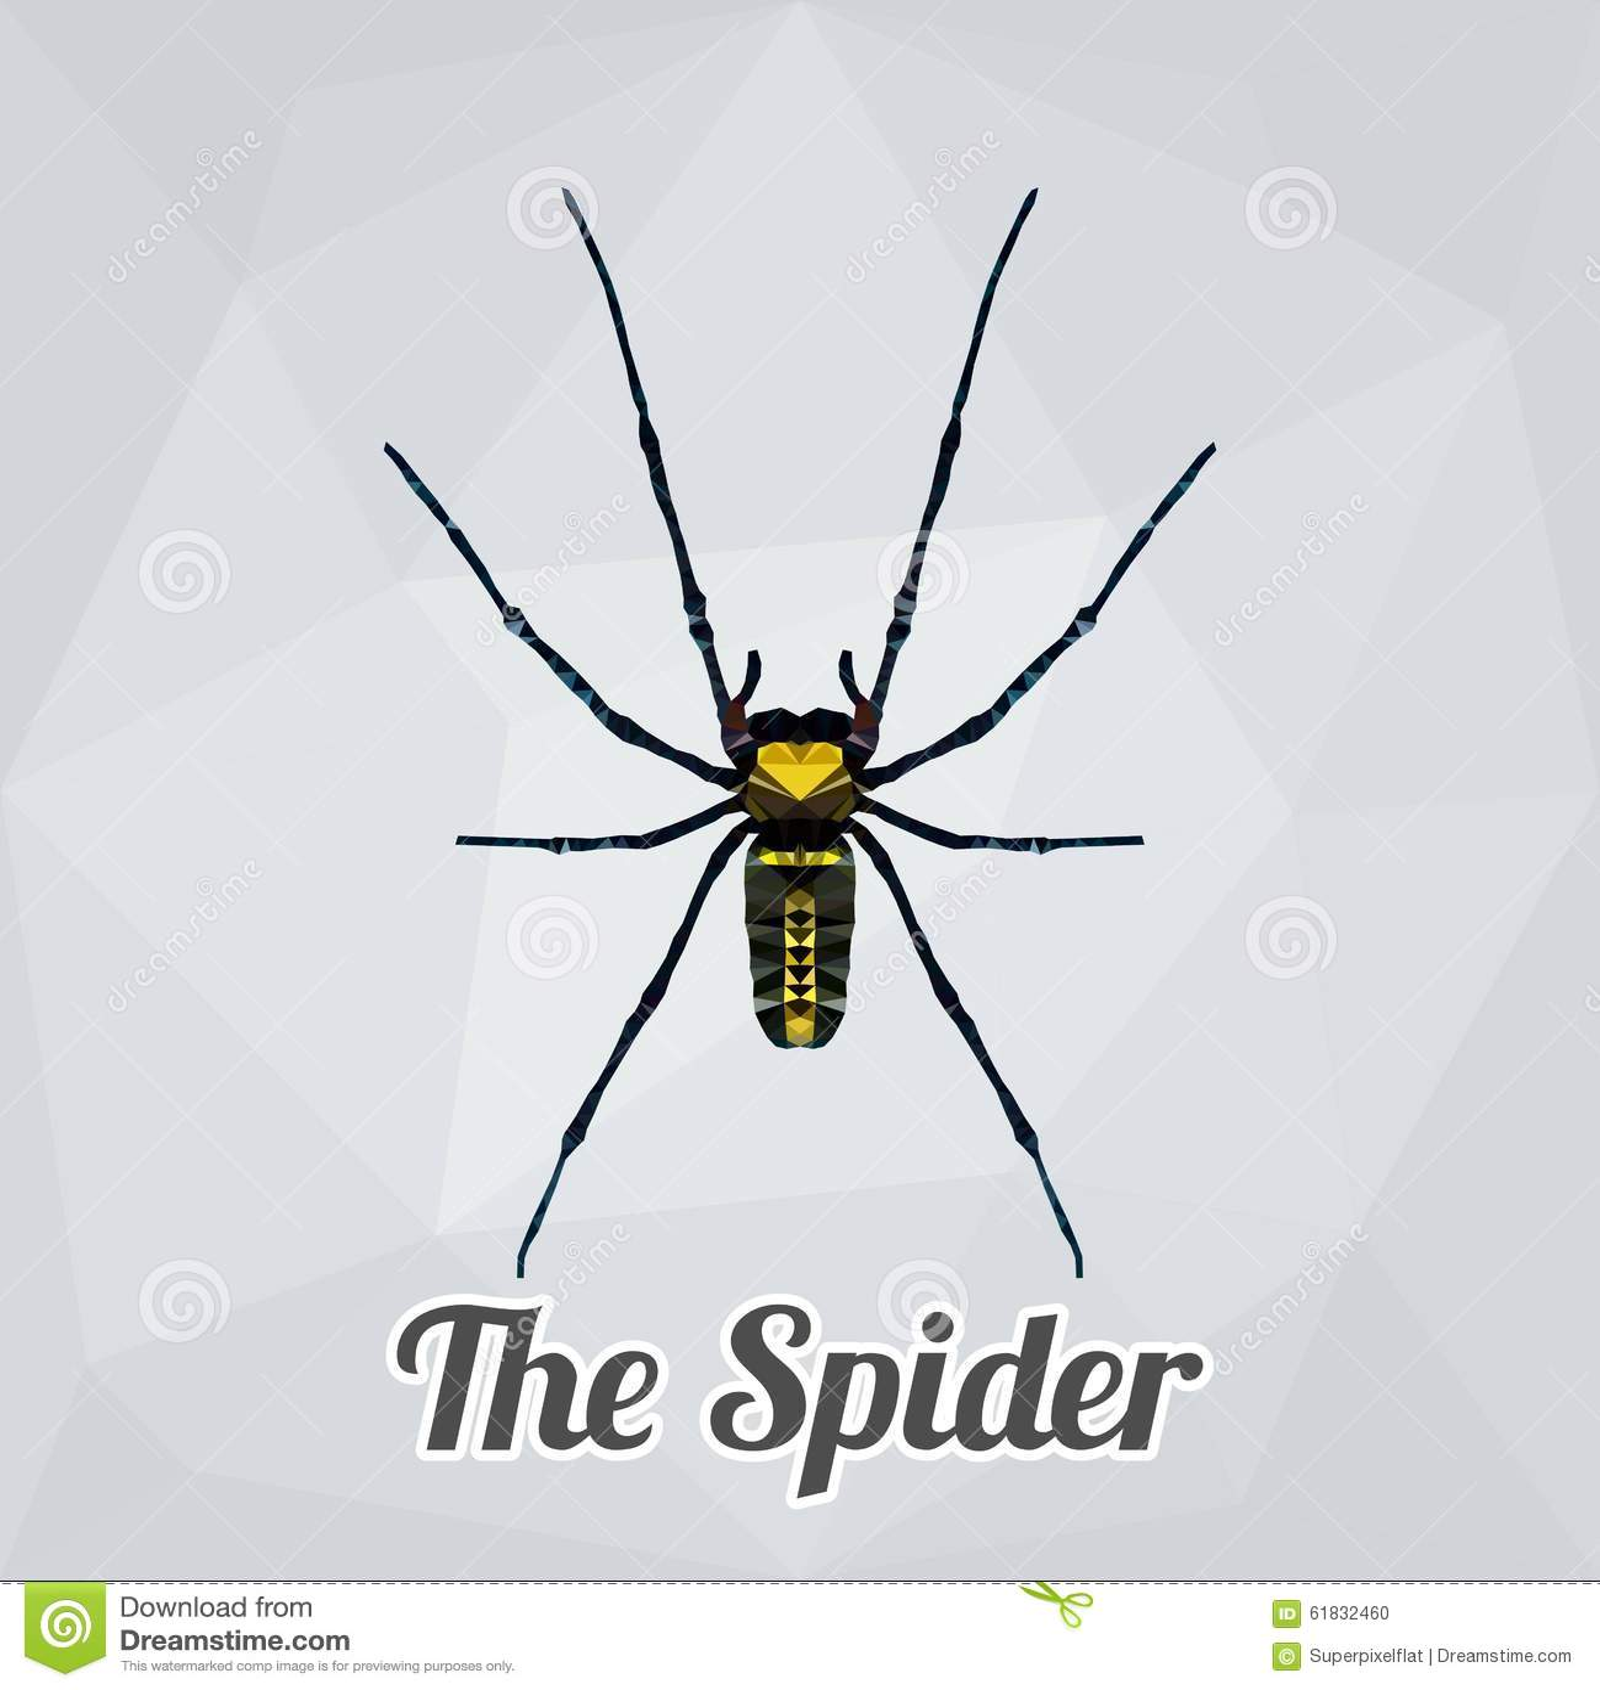 Aranha completa do corpo do vetor do polígono